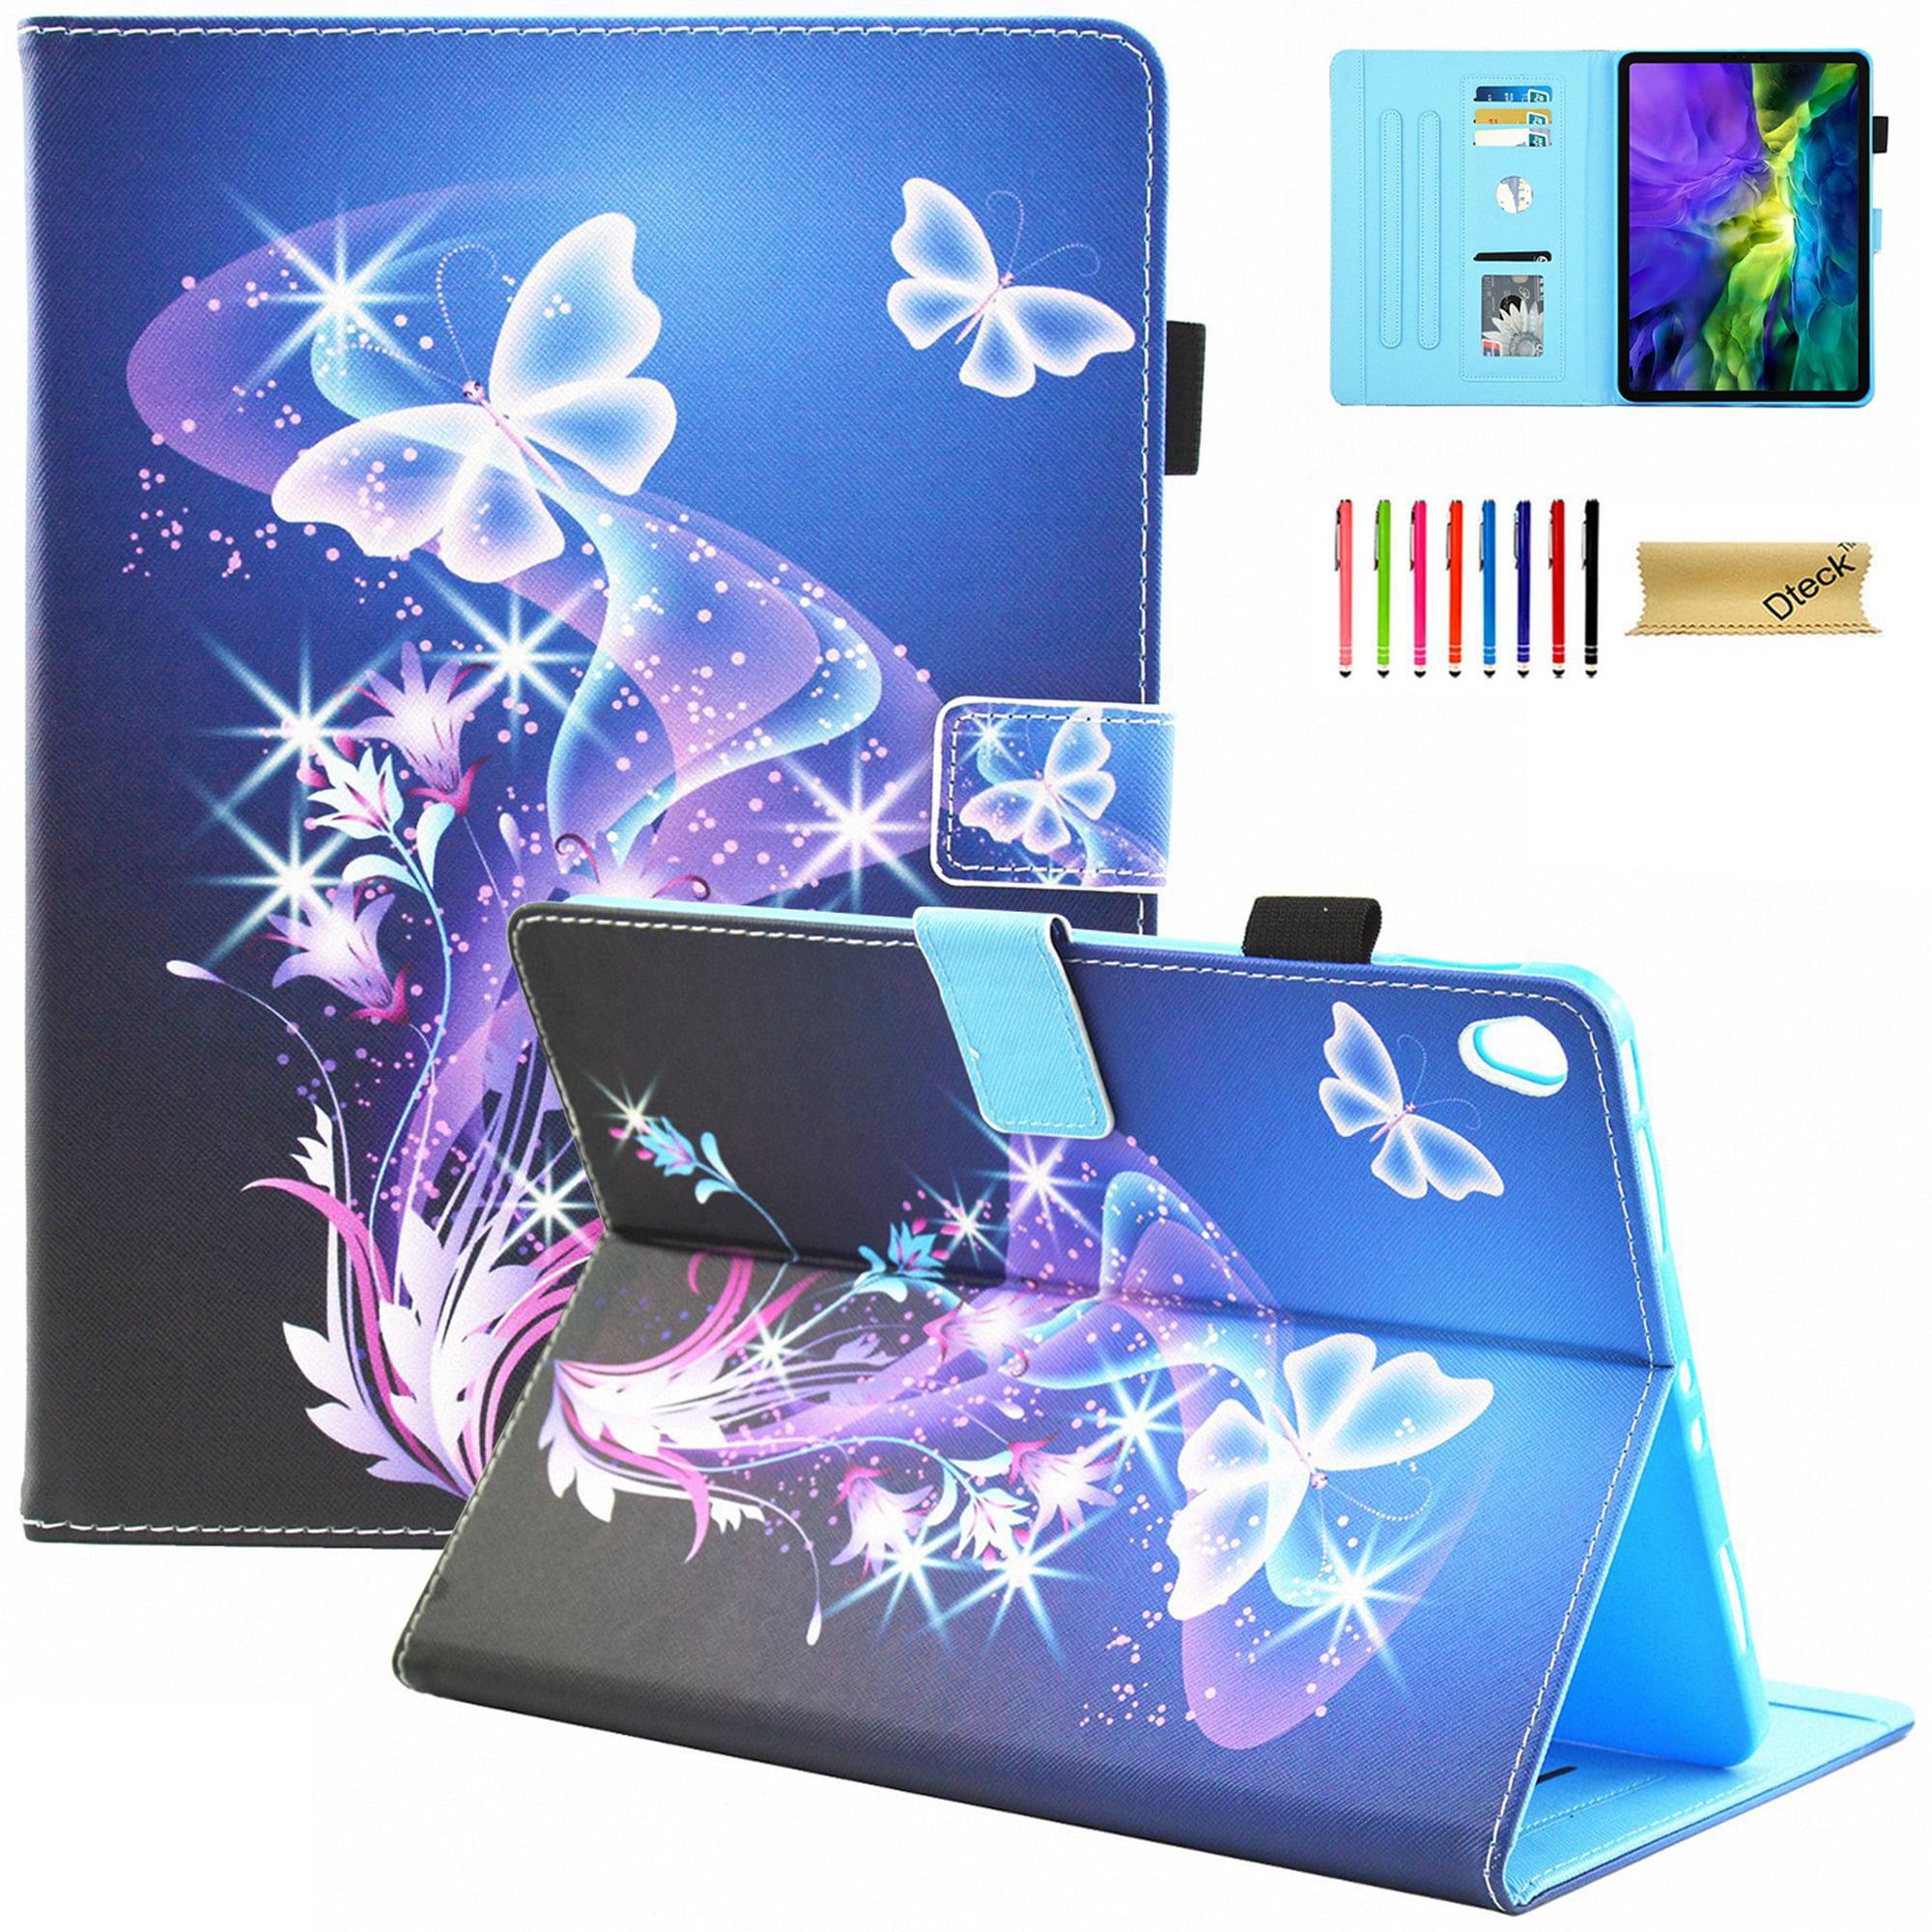 "Dteck Folio Case for iPad Air 4th 10.9""2020 / iPad Pro 11 ..."